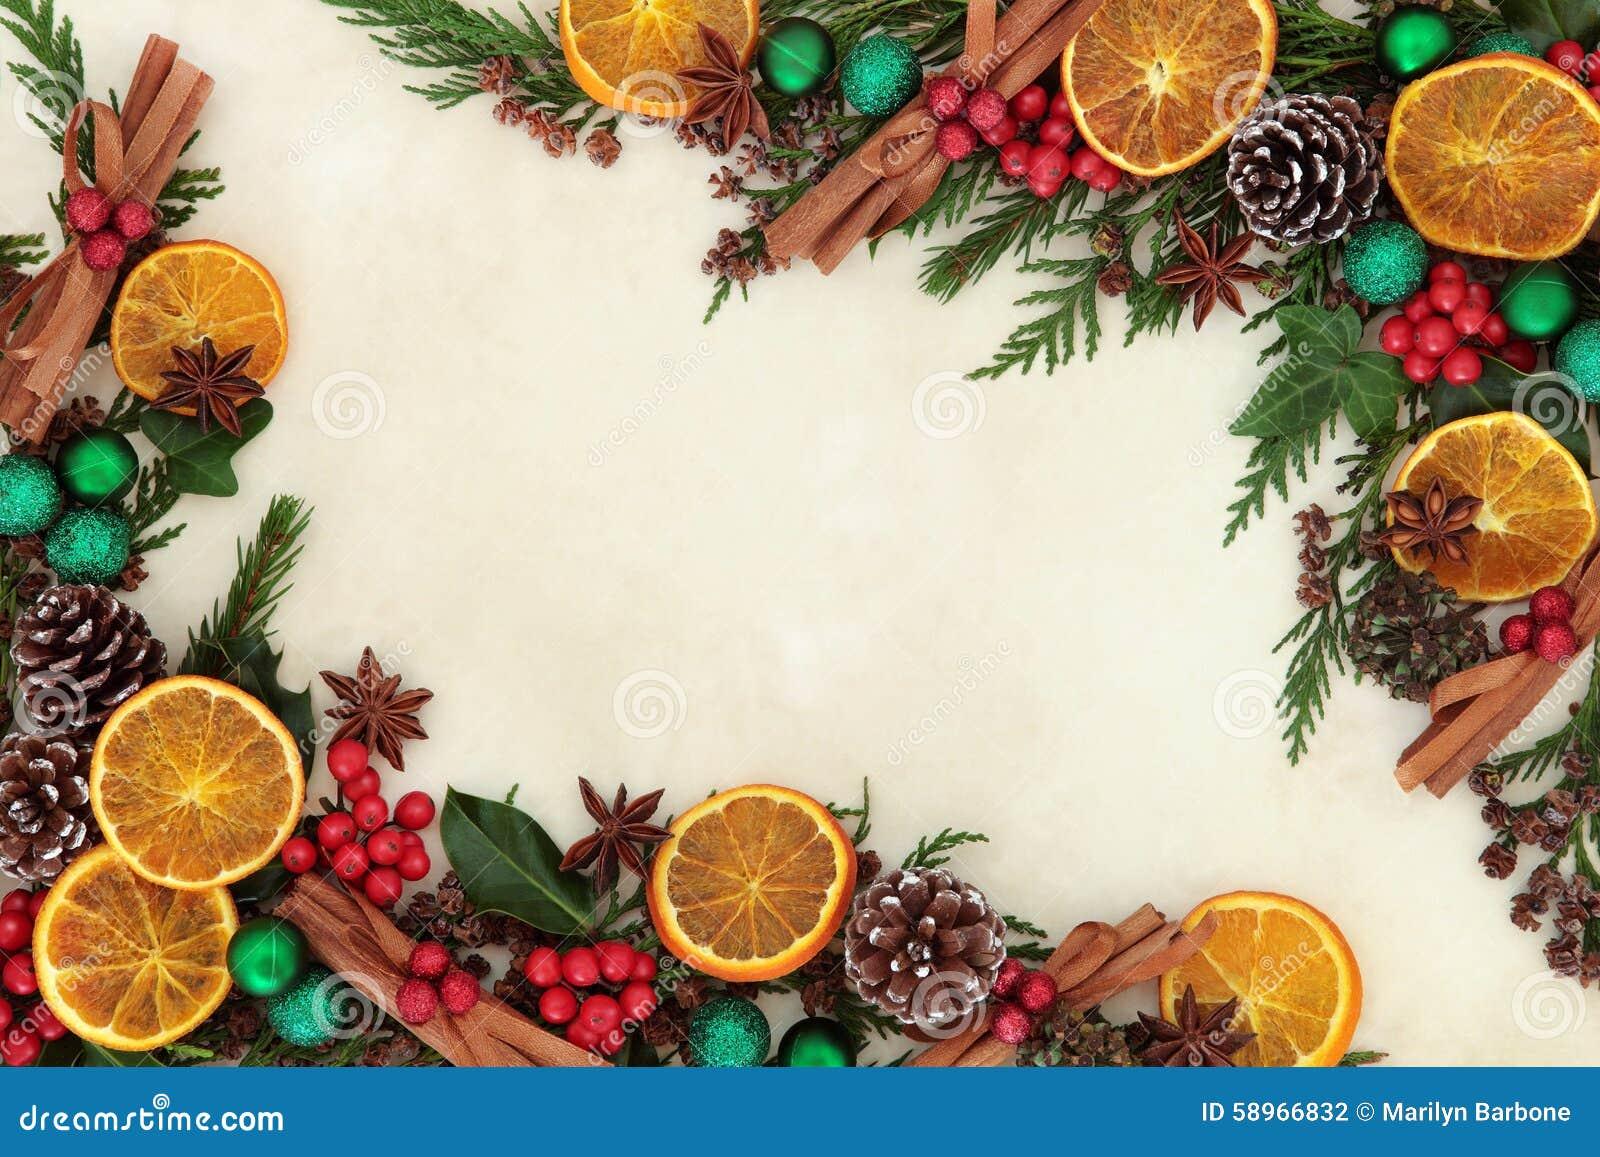 Christmas Fruit Decorations Part - 18: Background Bauble Border Christmas Dried Fruit ...